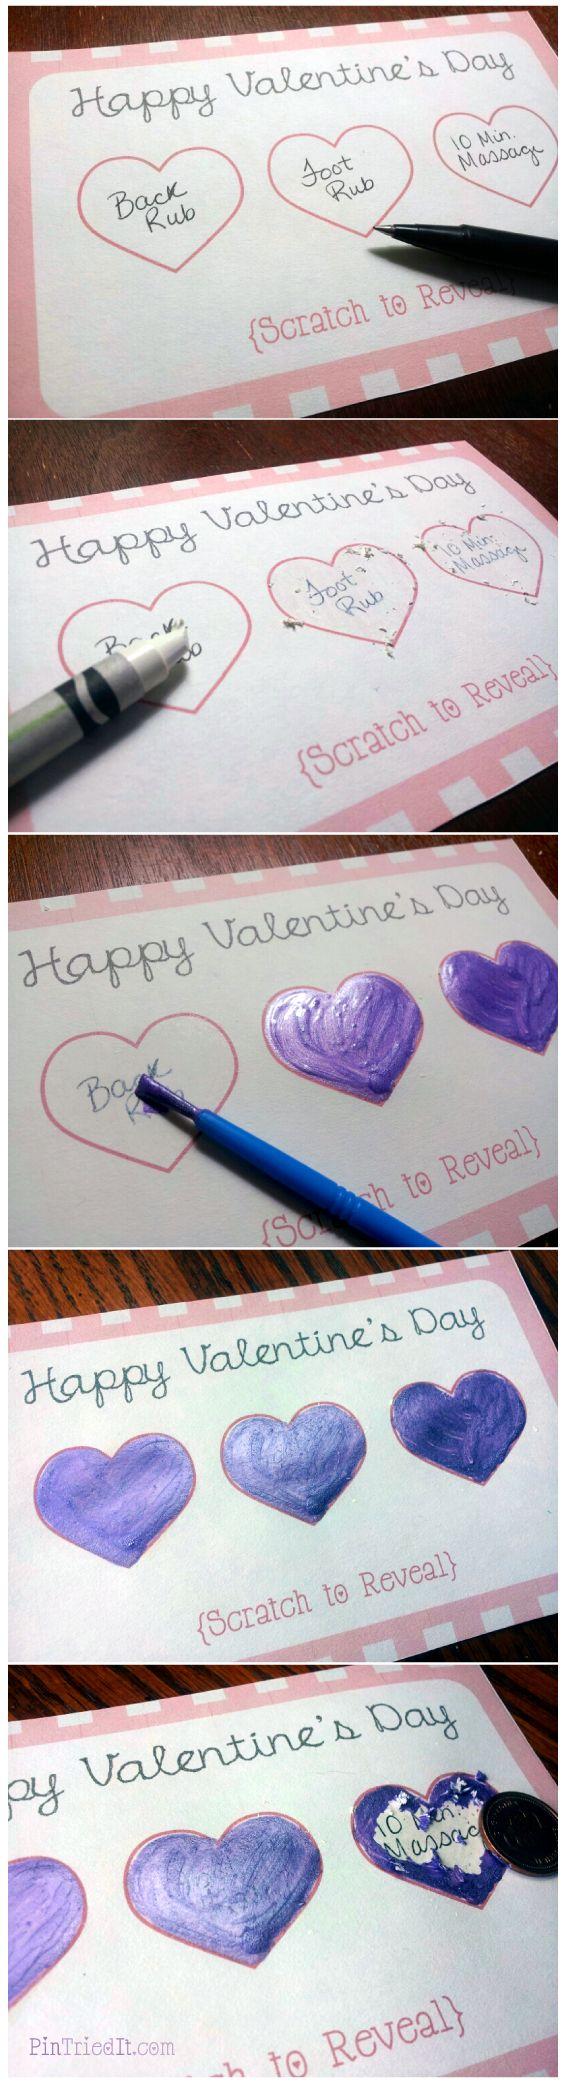 20 DIY Gifts For Girlfriend Or Boyfriend